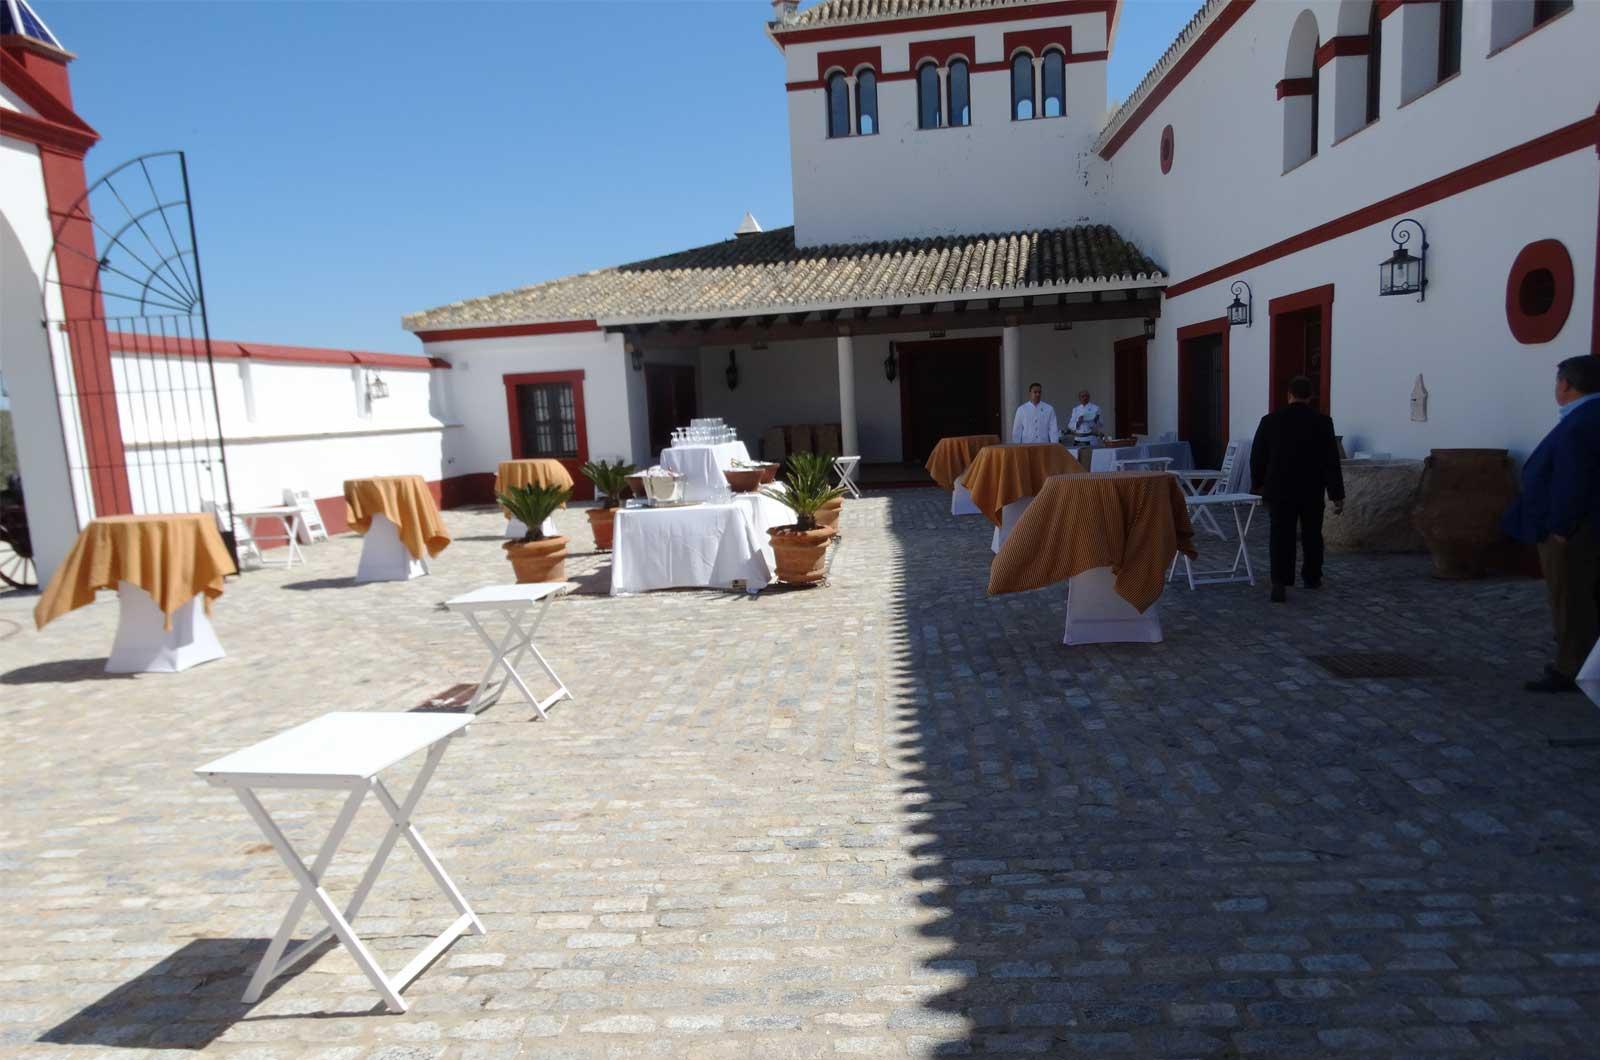 Hacienda el Caracol - patio<div style='clear:both;width:100%;height:0px;'></div><span class='cat'>Cortijo El Caracol</span><div style='clear:both;width:100%;height:0px;'></div><span class='desc'>Hacienda el Caracol - patio</span>